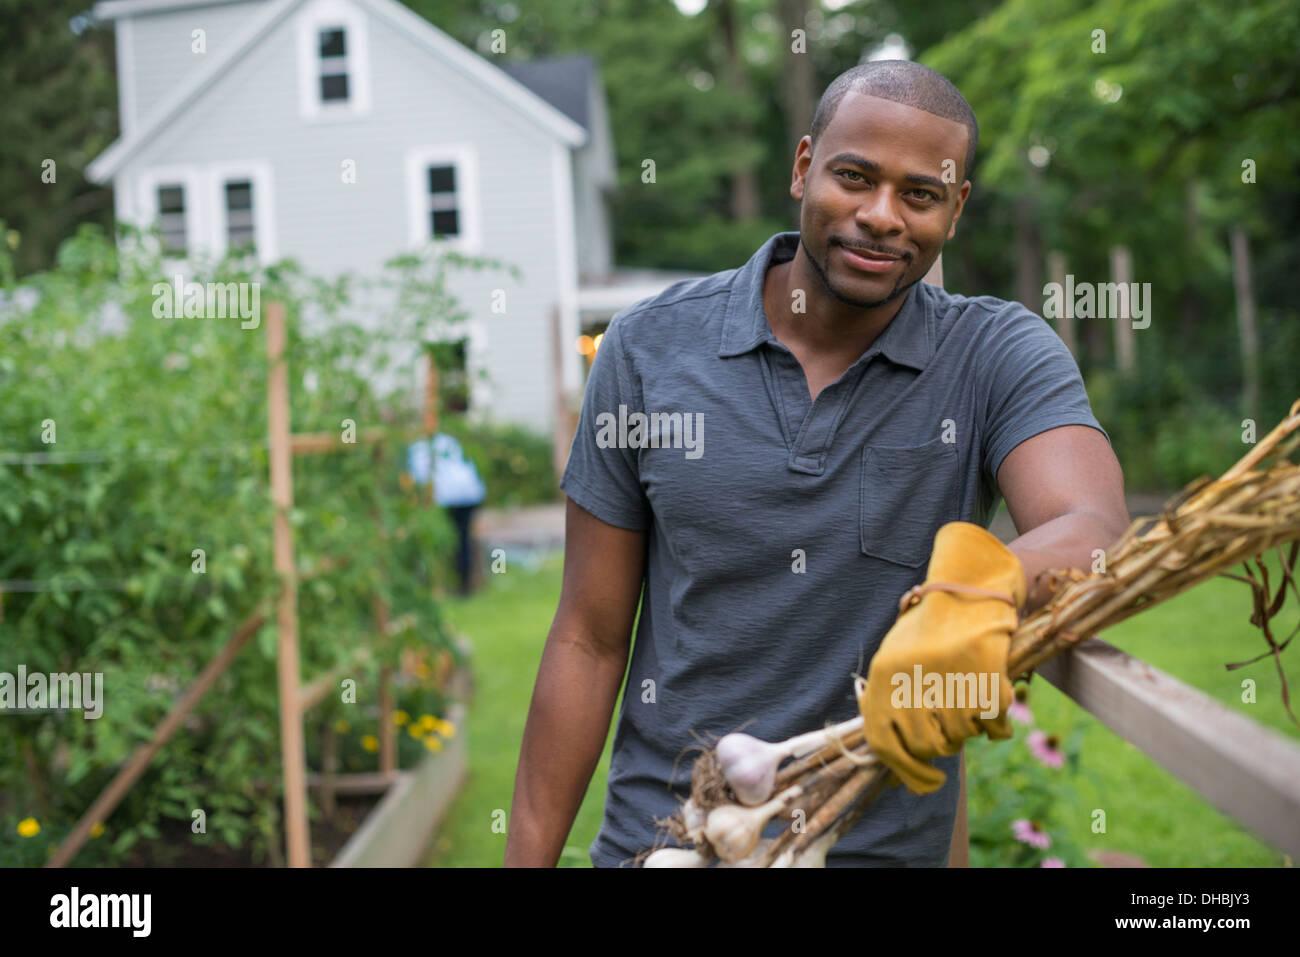 A man in gloves harvesting garlic bulbs in the vegetable garden. - Stock Image